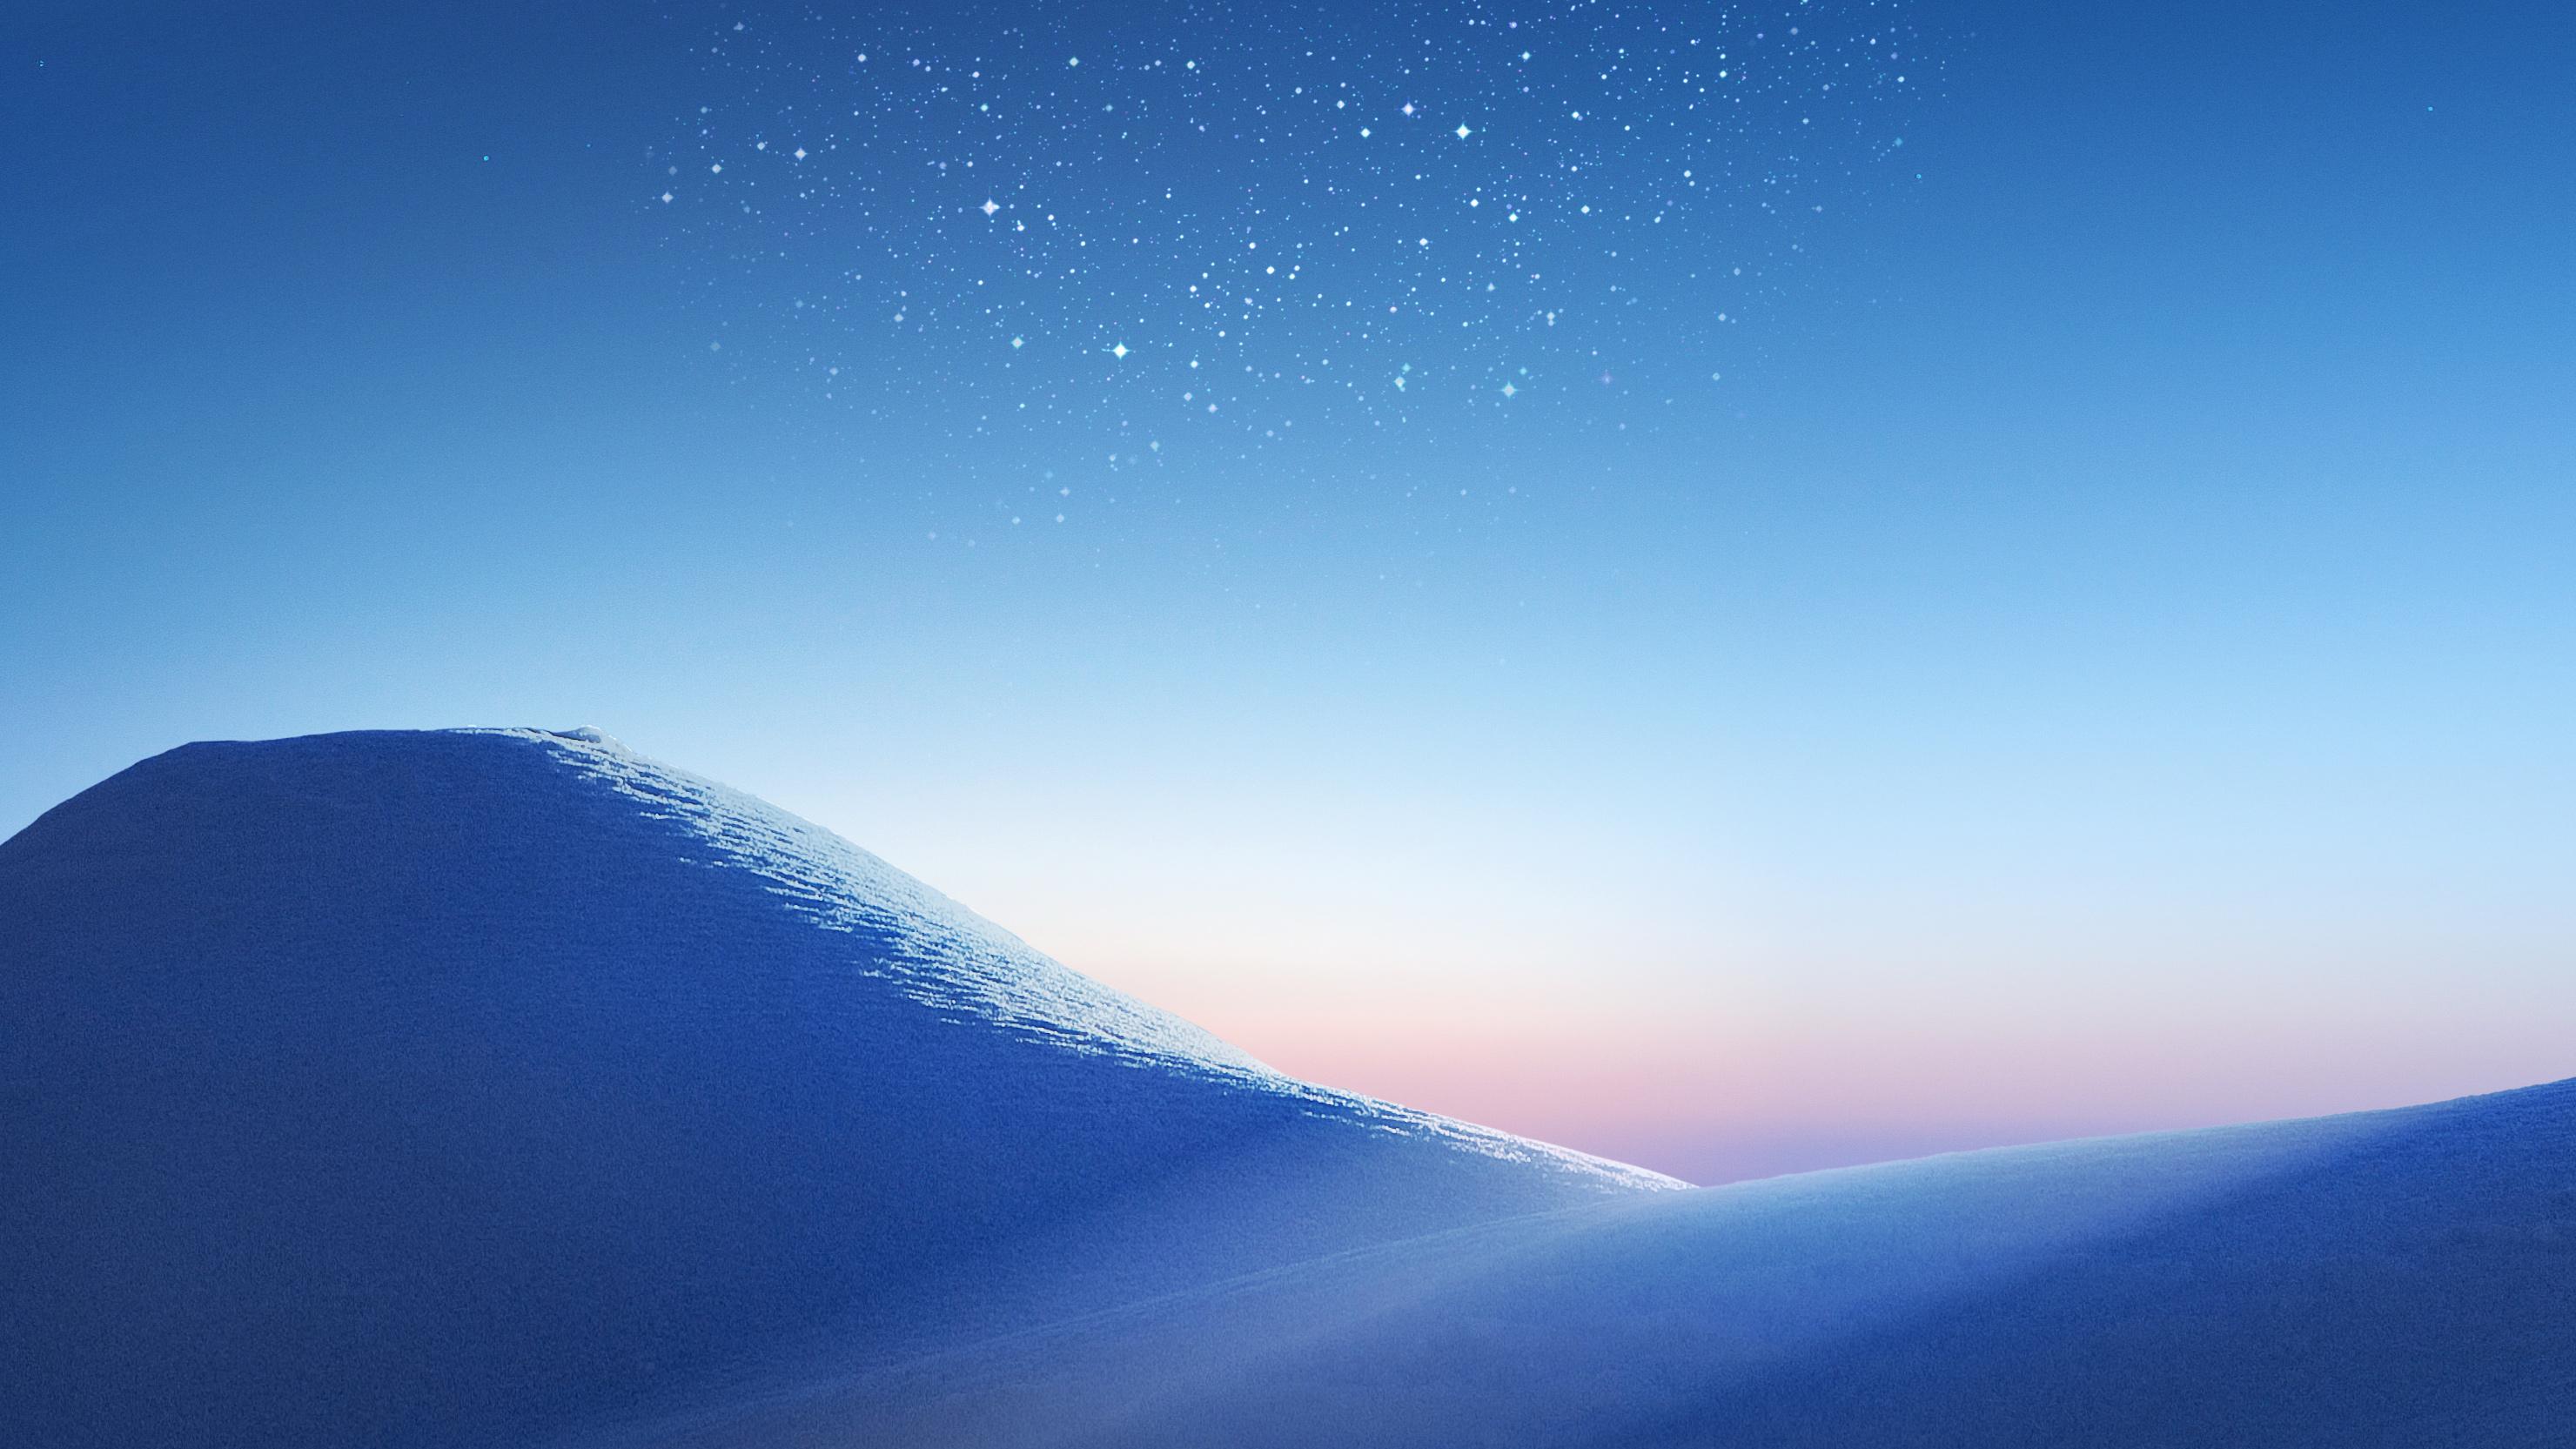 Samsung Galaxy S8 Wallpaper For Pc 2960x1665 Download Hd Wallpaper Wallpapertip